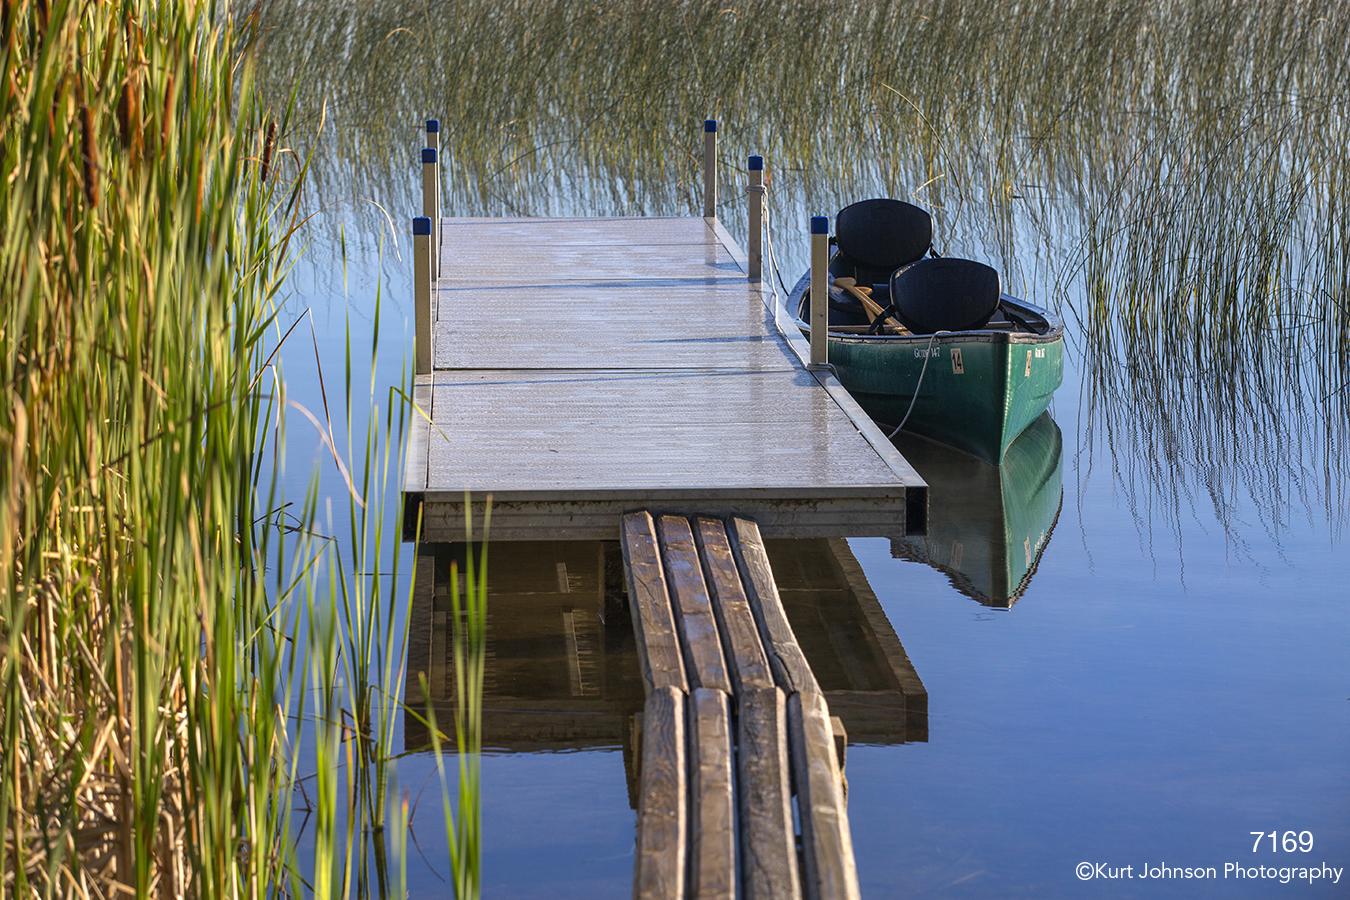 waterscape landscape water dock canoe grasses green blue pond